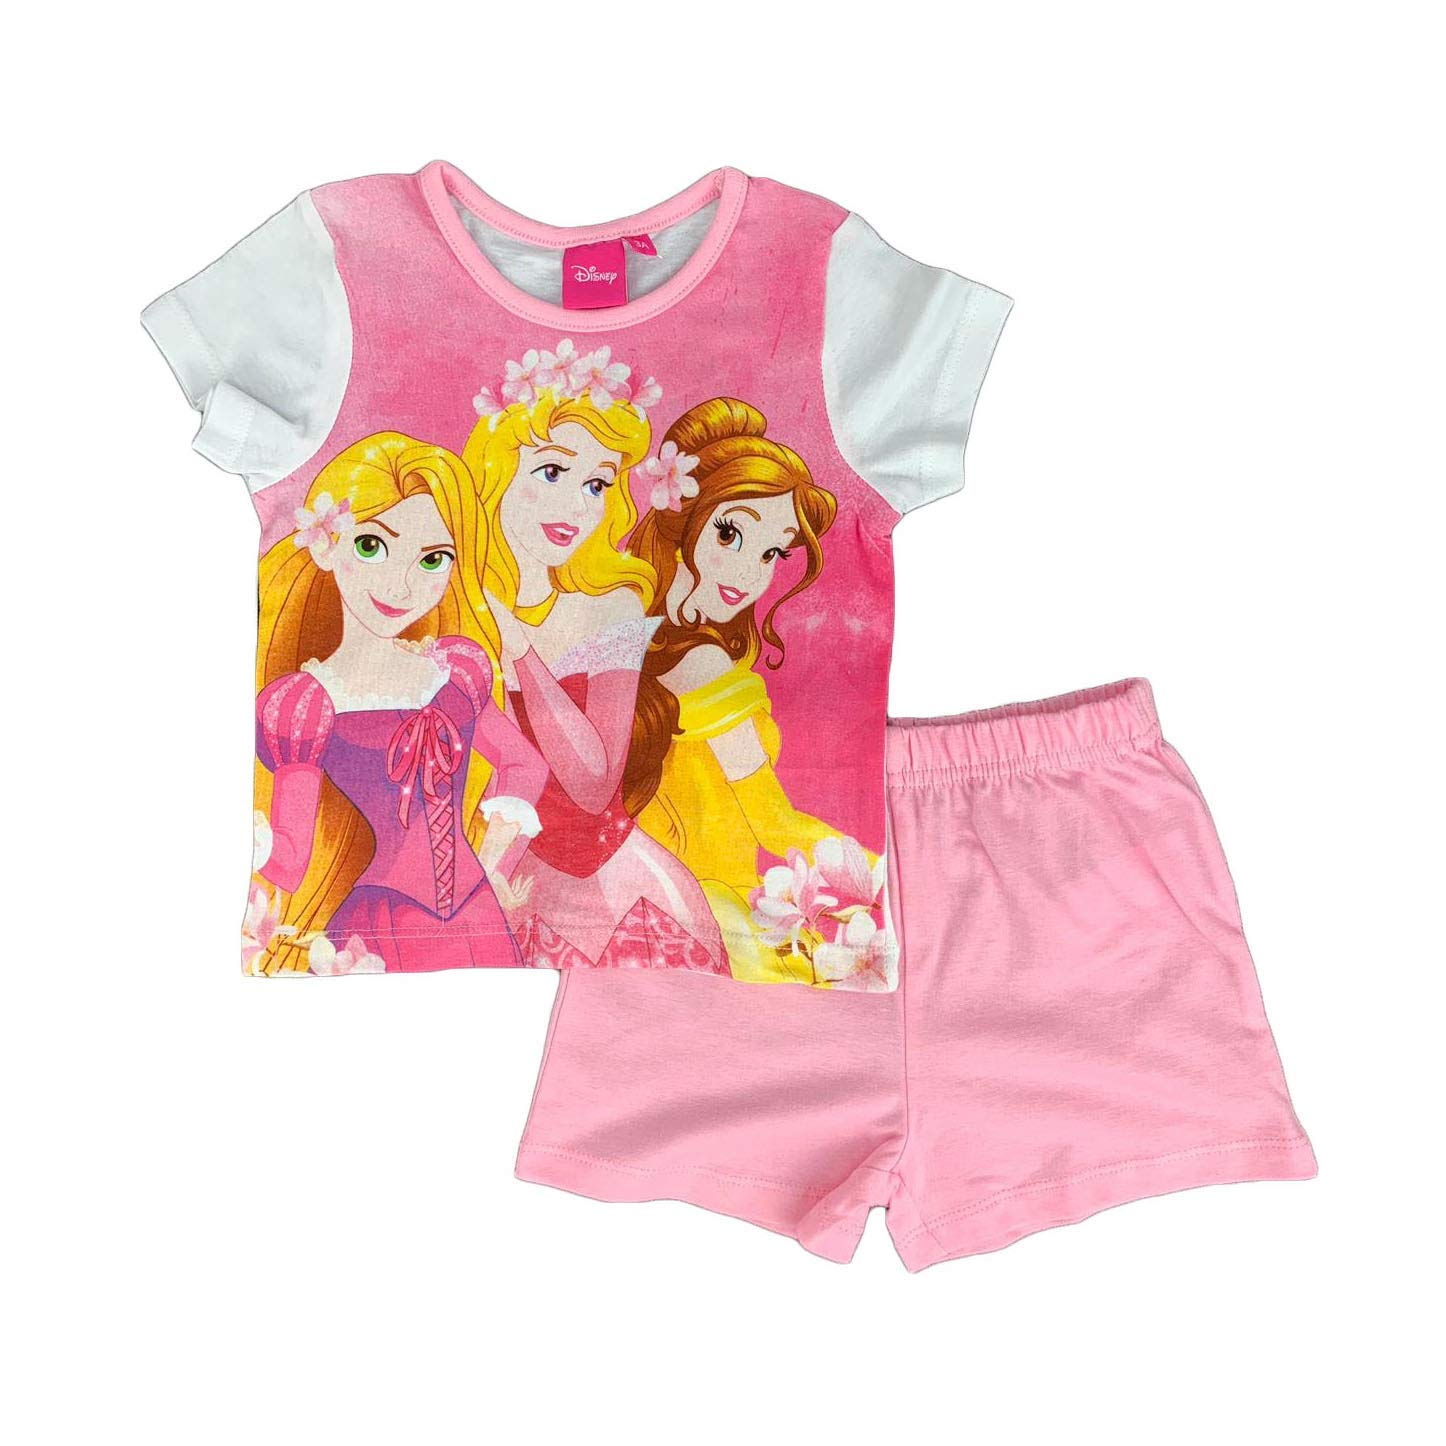 Pigiama Bambina Disney Principesse T-Shirt e Pantaloncino in Cotone Stampa 1022